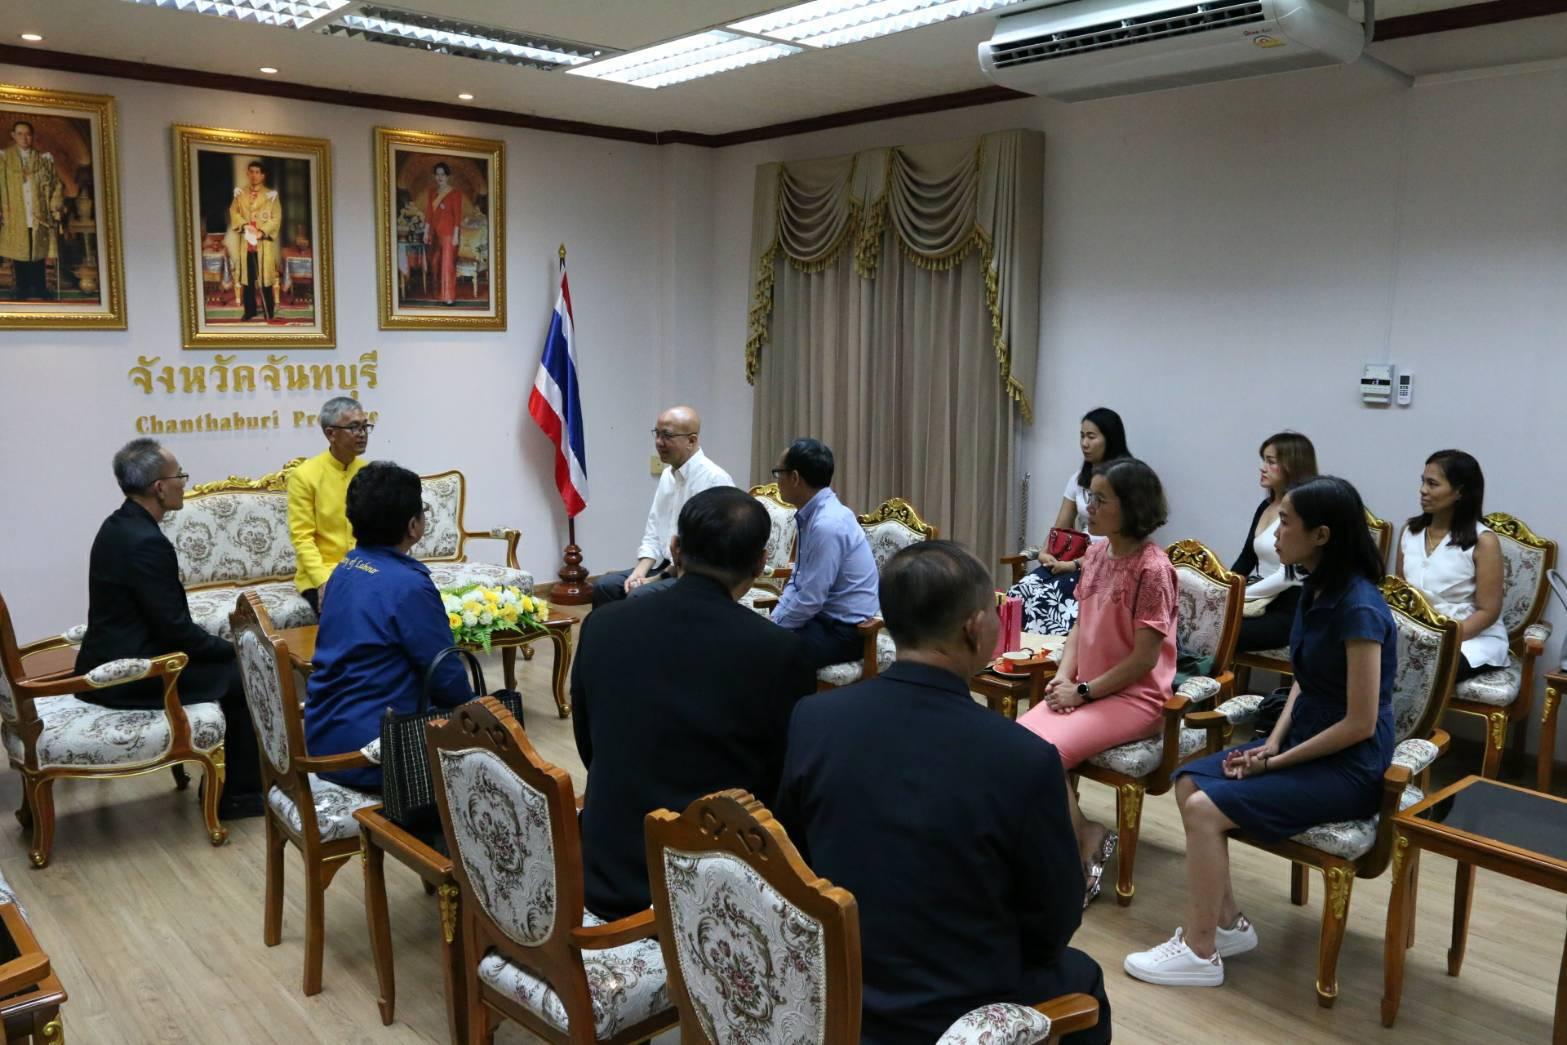 elumeo SE: Thai PWK Employees Outraged by False Statements